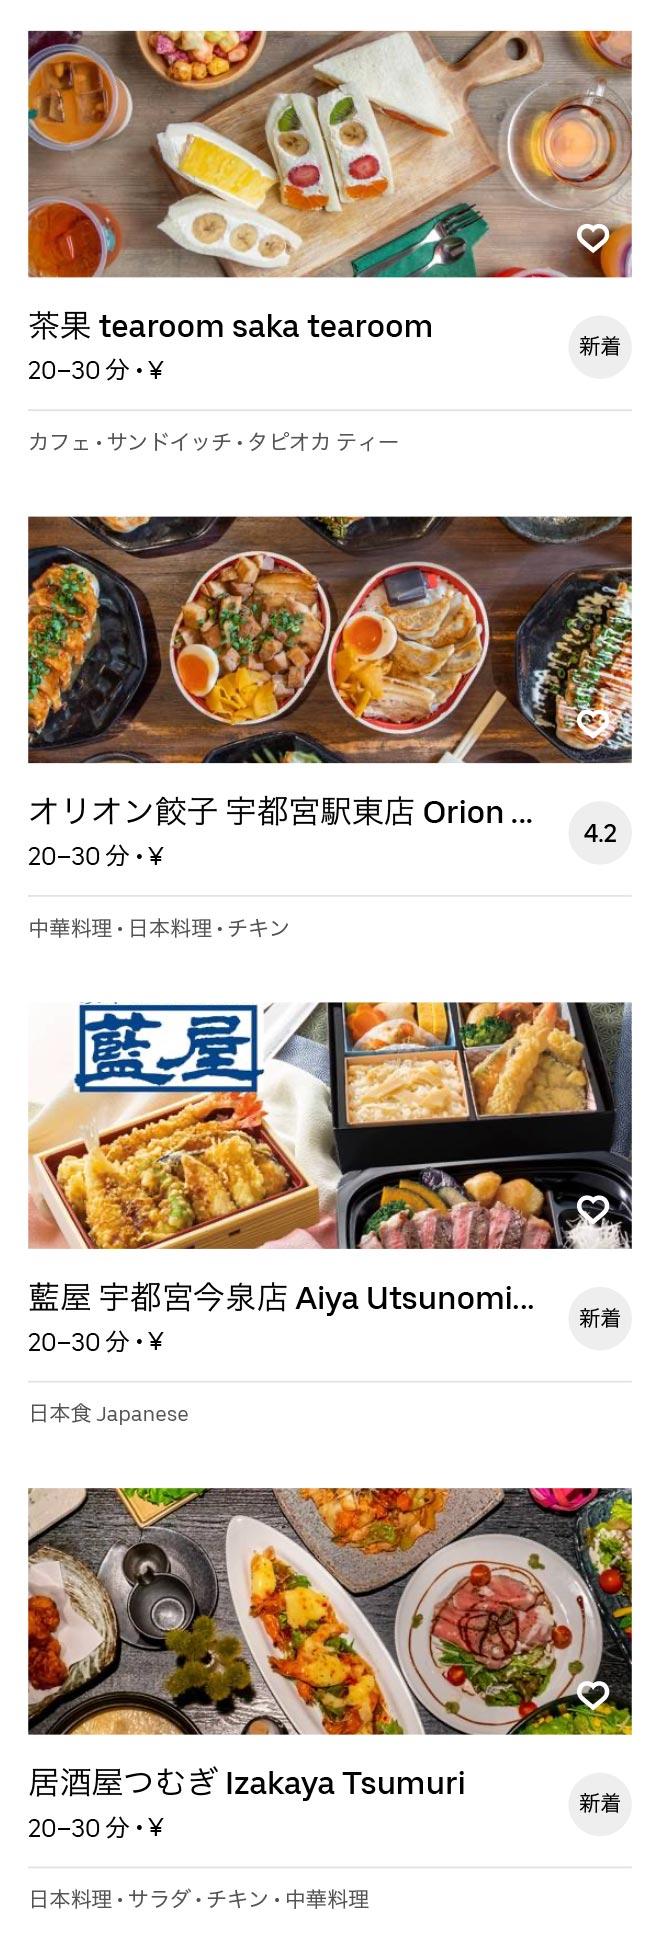 Utsunomiya menu 200607